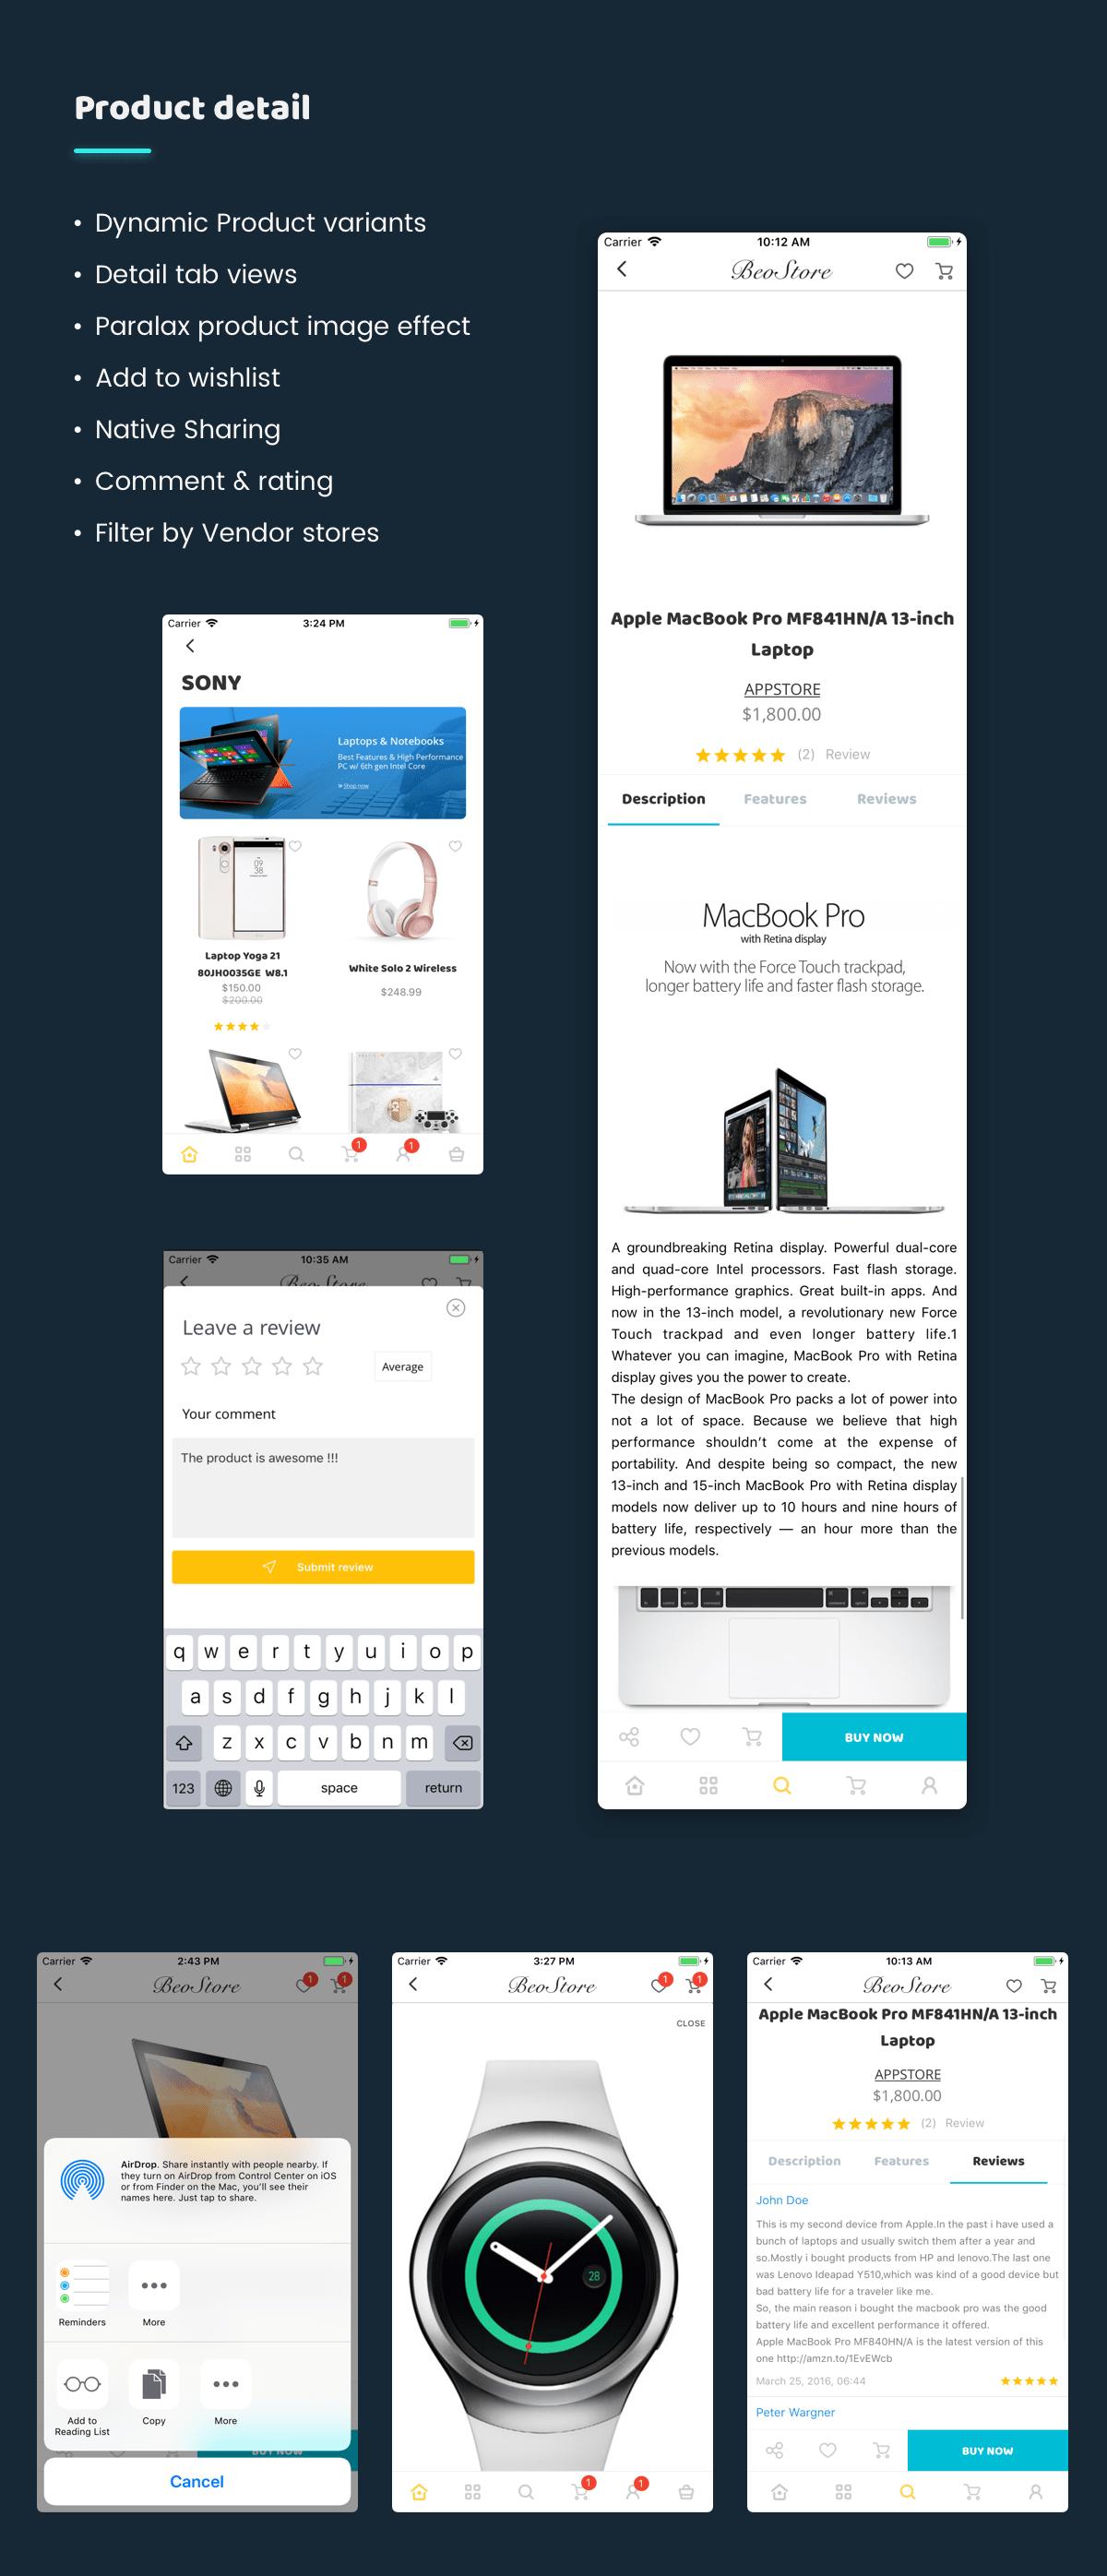 687474703a2f2f6d73746f72652e696f2f77702d636f6e74656e742f75706c6f6164732f323031382f30372f70726f647563742e706e67 - سورس اپلیکیشن MStore pro Multi vendor | اپلیکیشن ووکامرس و دکان ( android / Ios )